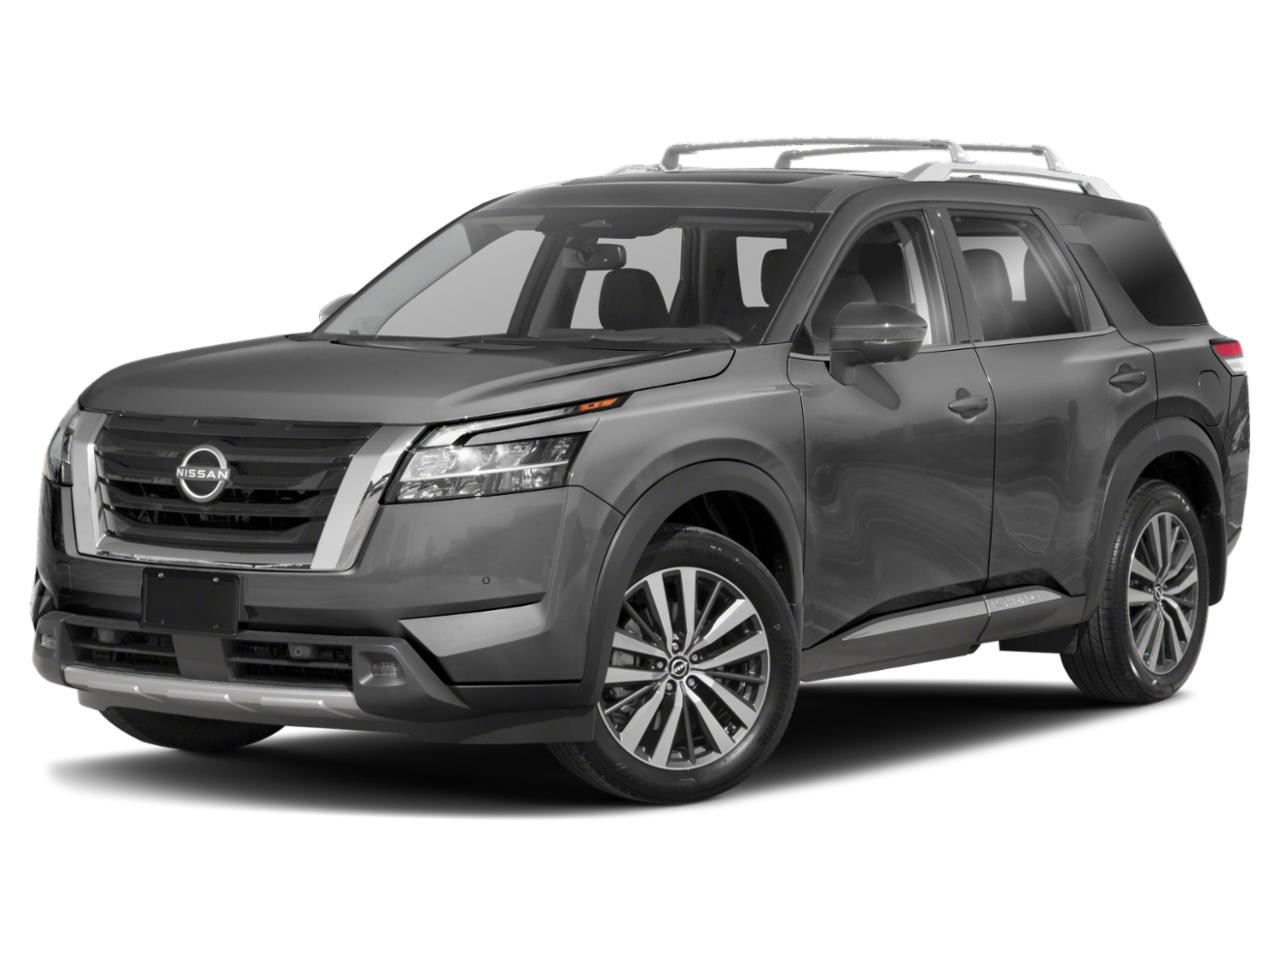 2022 Nissan Pathfinder Vehicle Photo in Appleton, WI 54913